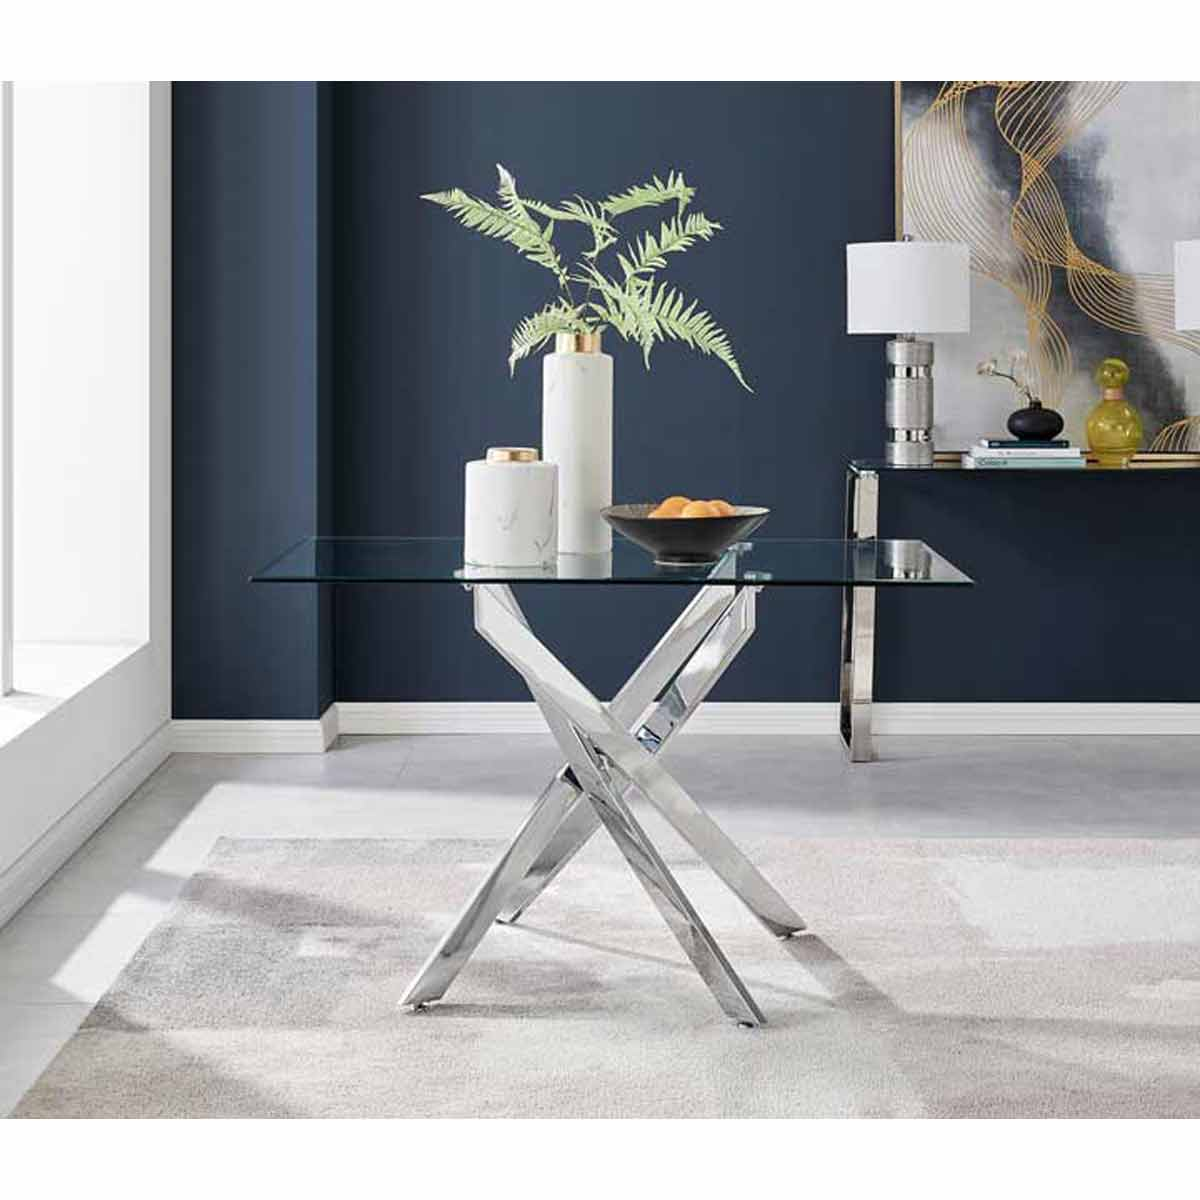 Furniture Box Leonardo 4 Seater Glass And Chrome Metal Dining Table